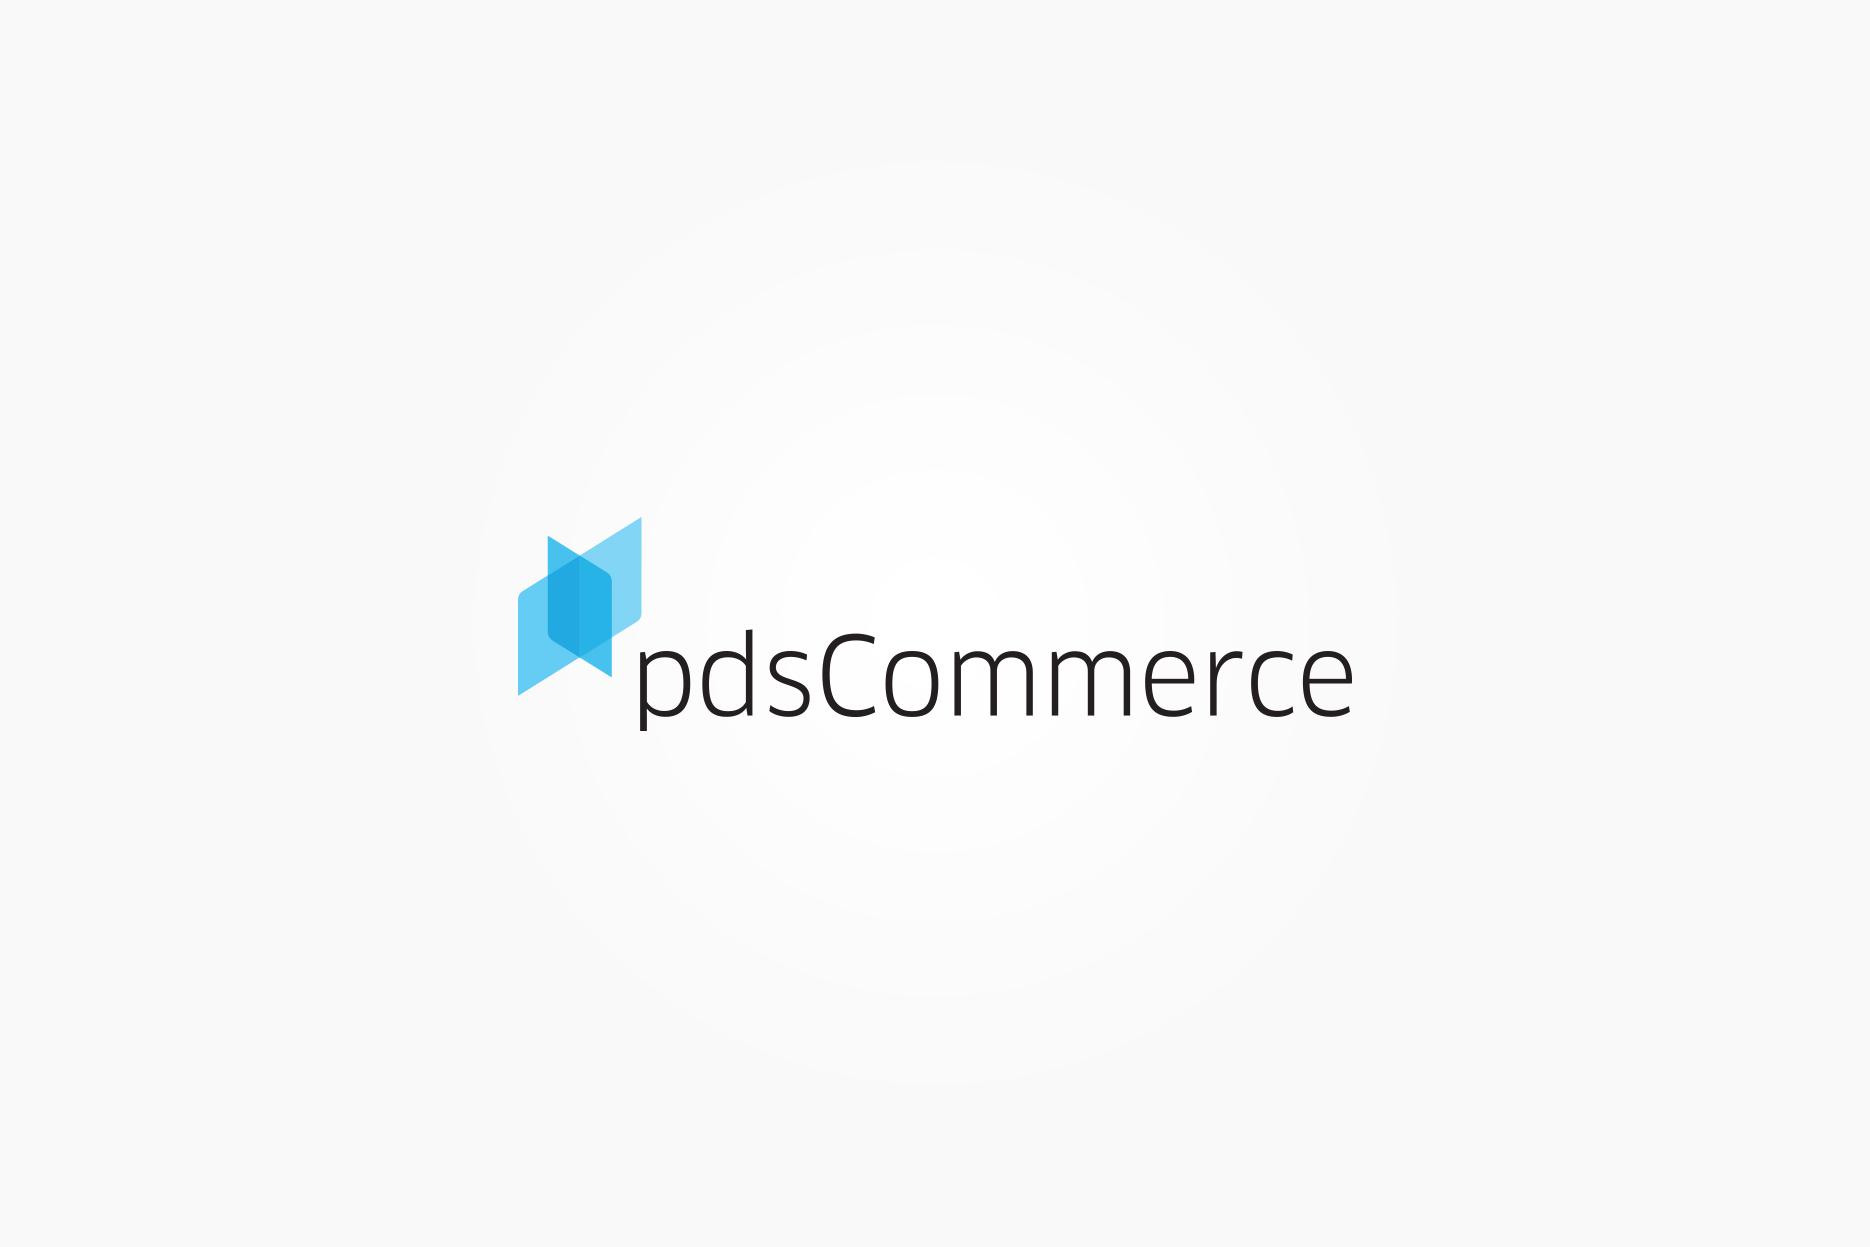 pdsc_logo